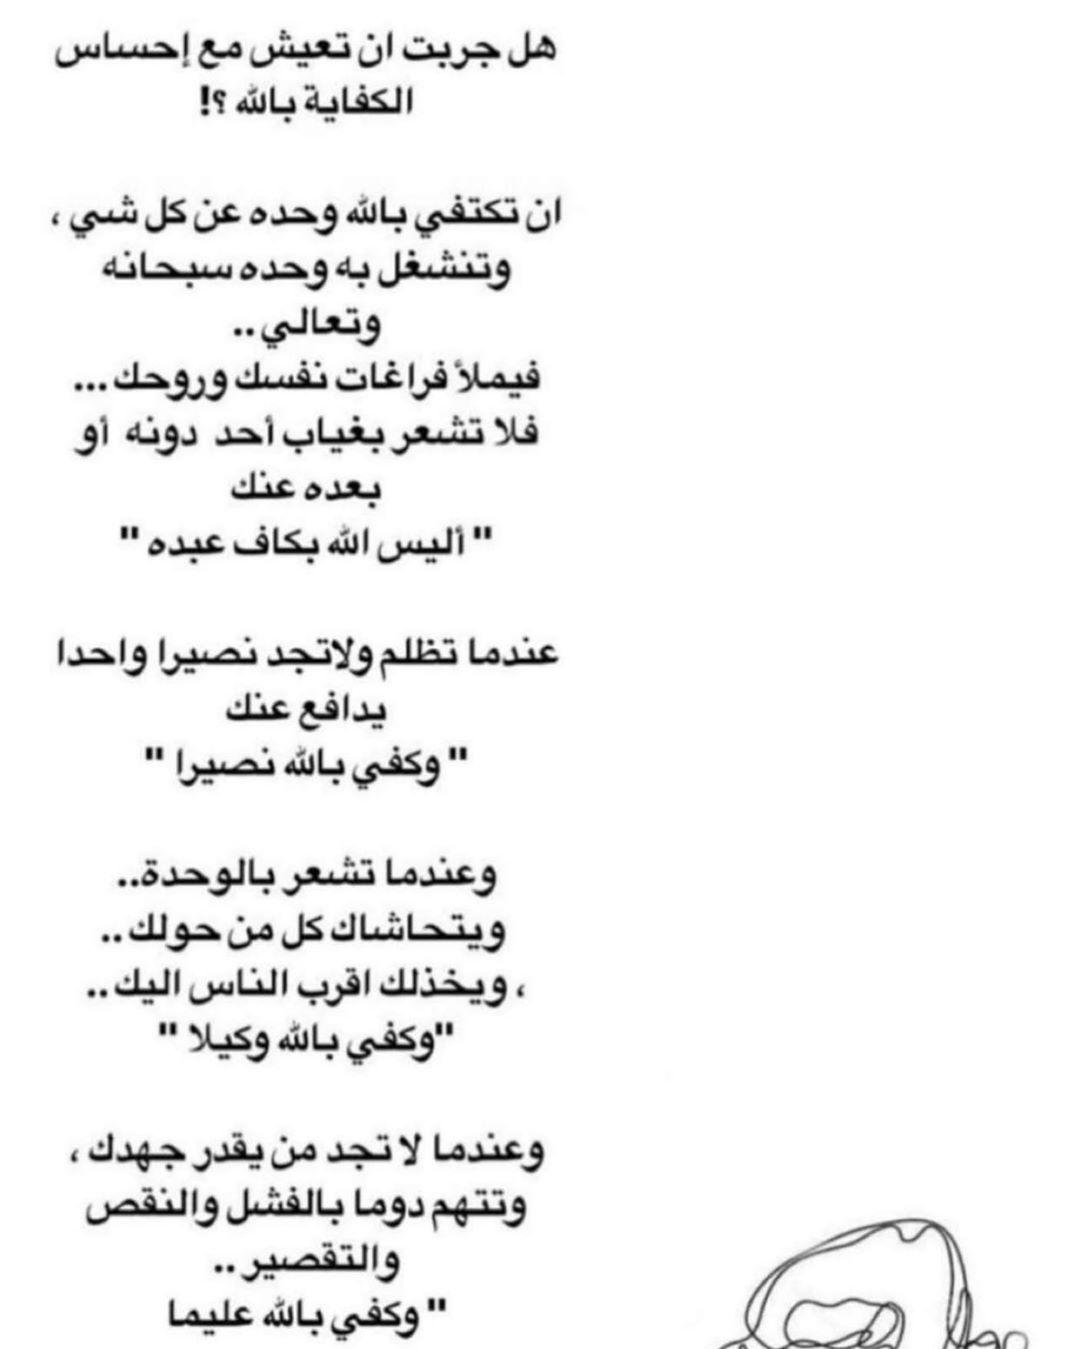 Islam Quotes Duaa Allahuakbar Hasanat Alhamdulillah Good Pray Love Peace God Life الله الحمدلله الله اكبر صدق صدقة Instagram Posts Math Post